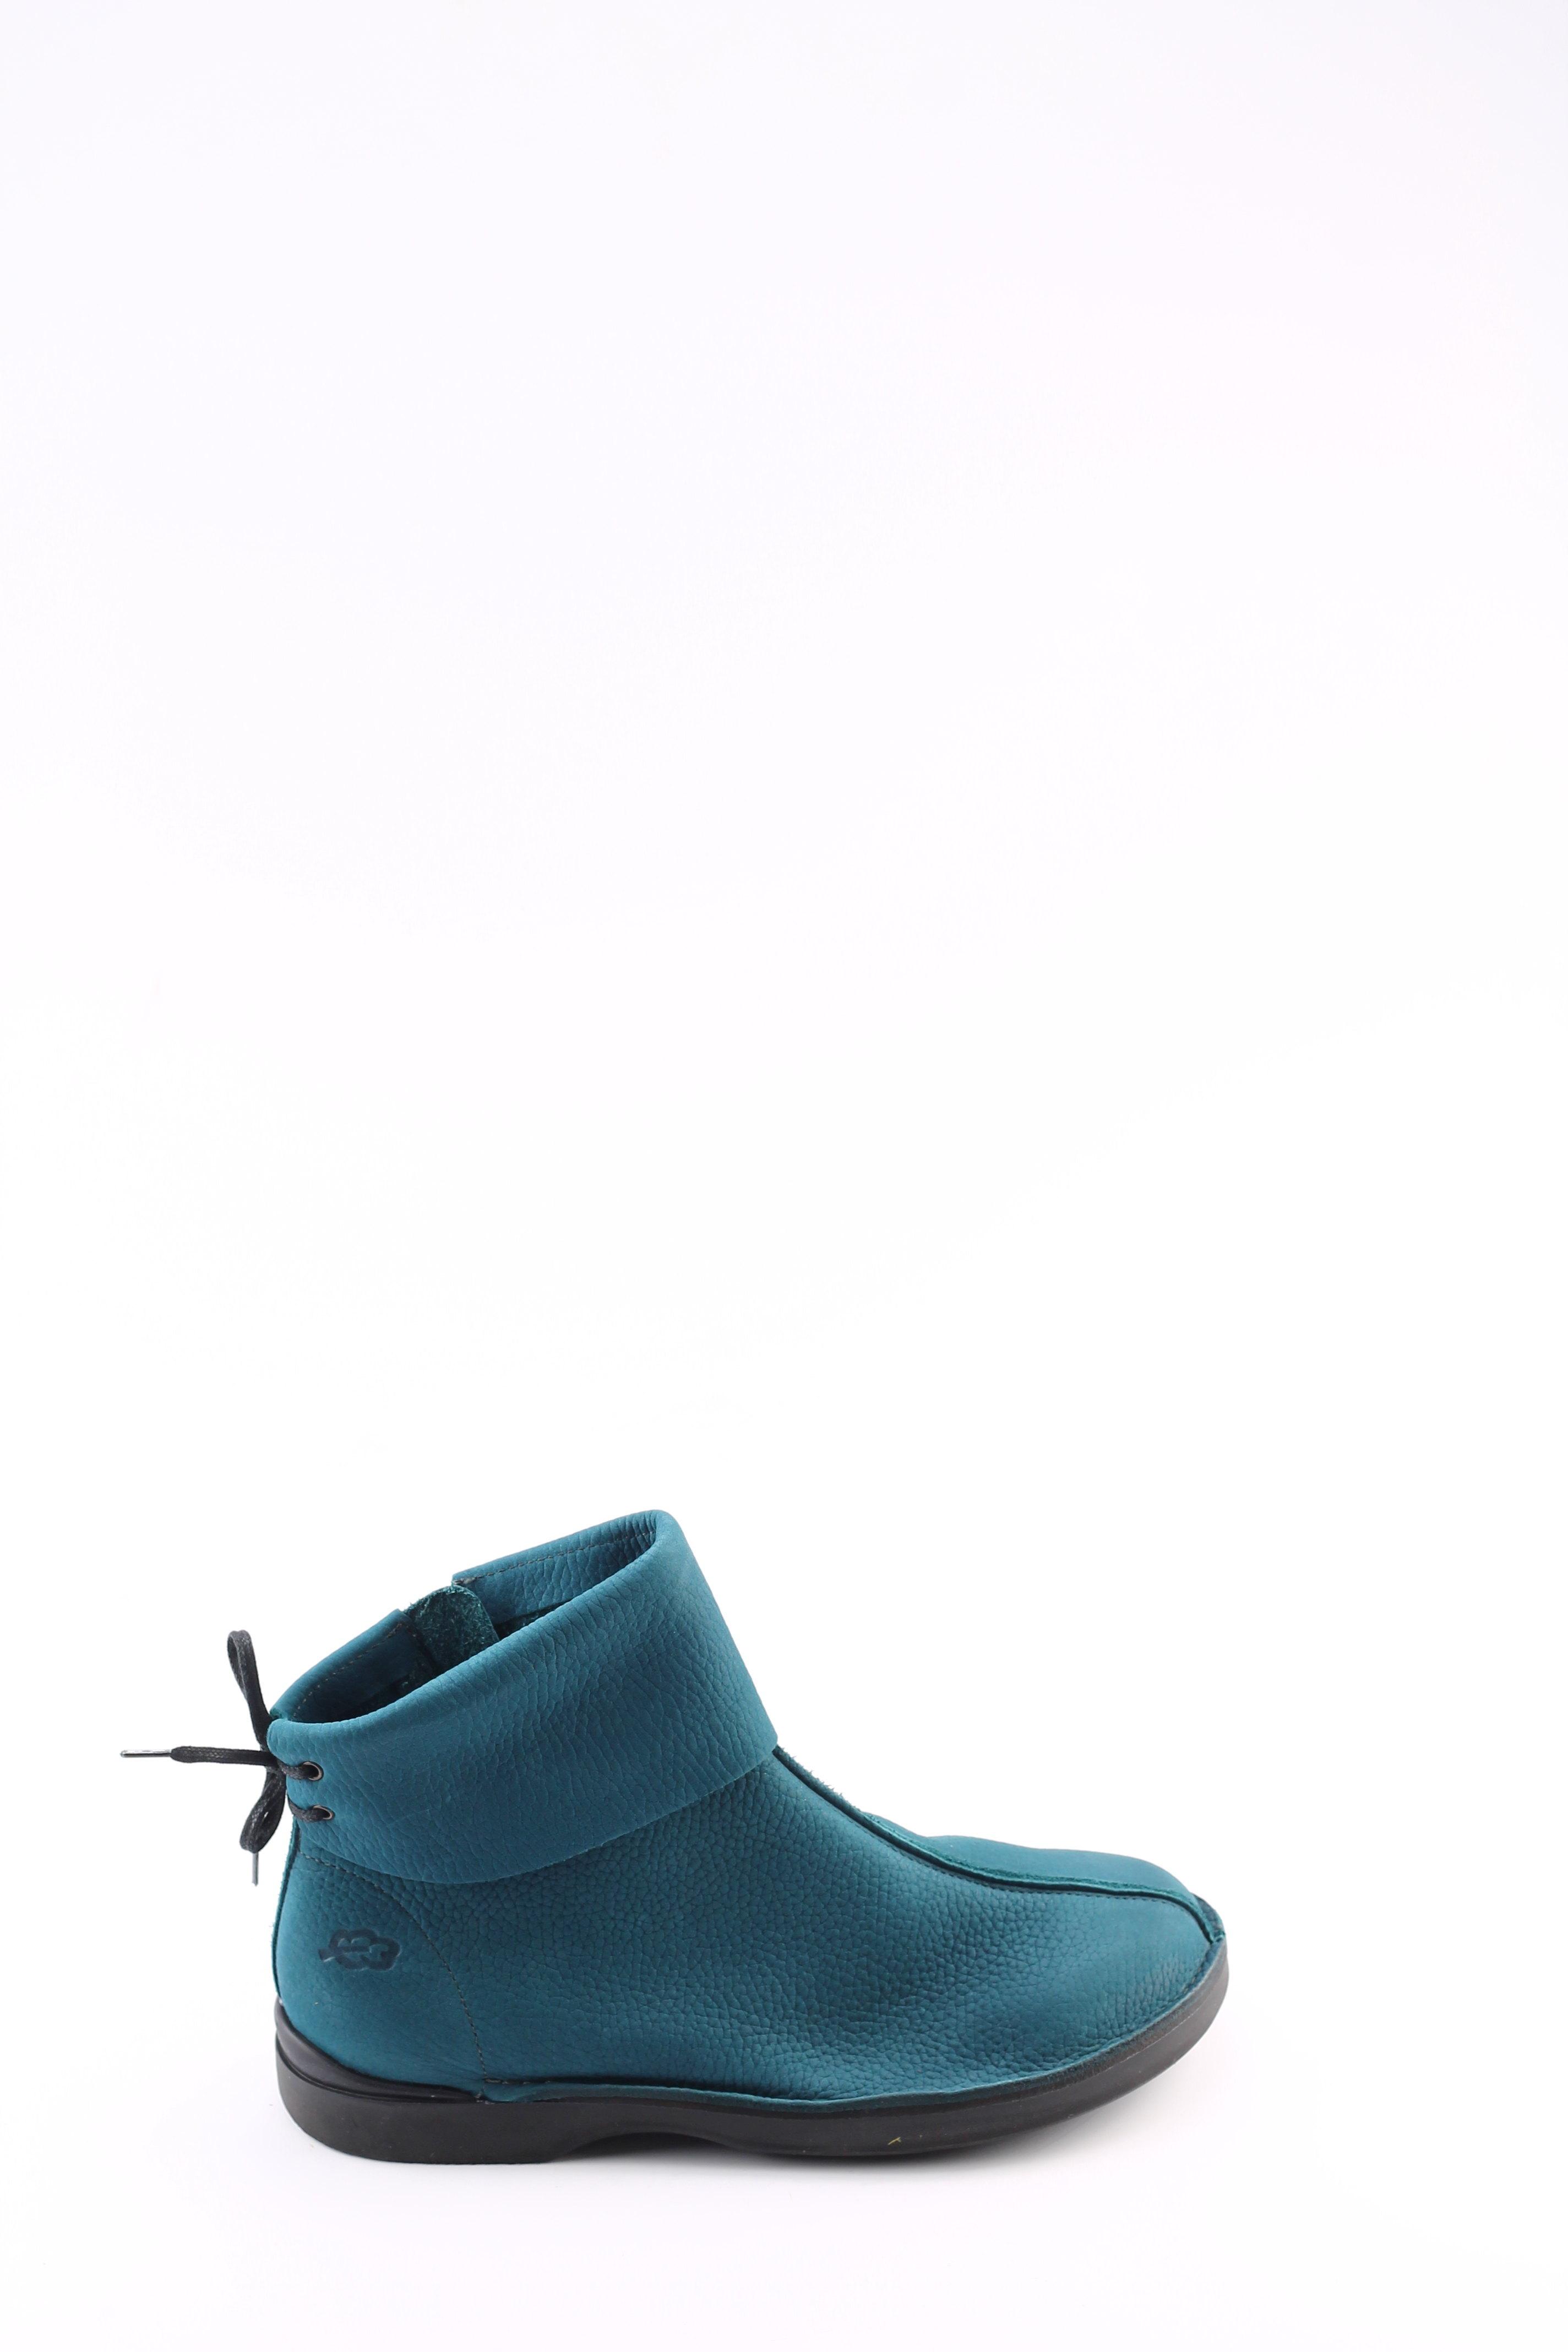 Loints 57903 turquoise dames korte laarsjes | Theo Jansen Schoenen